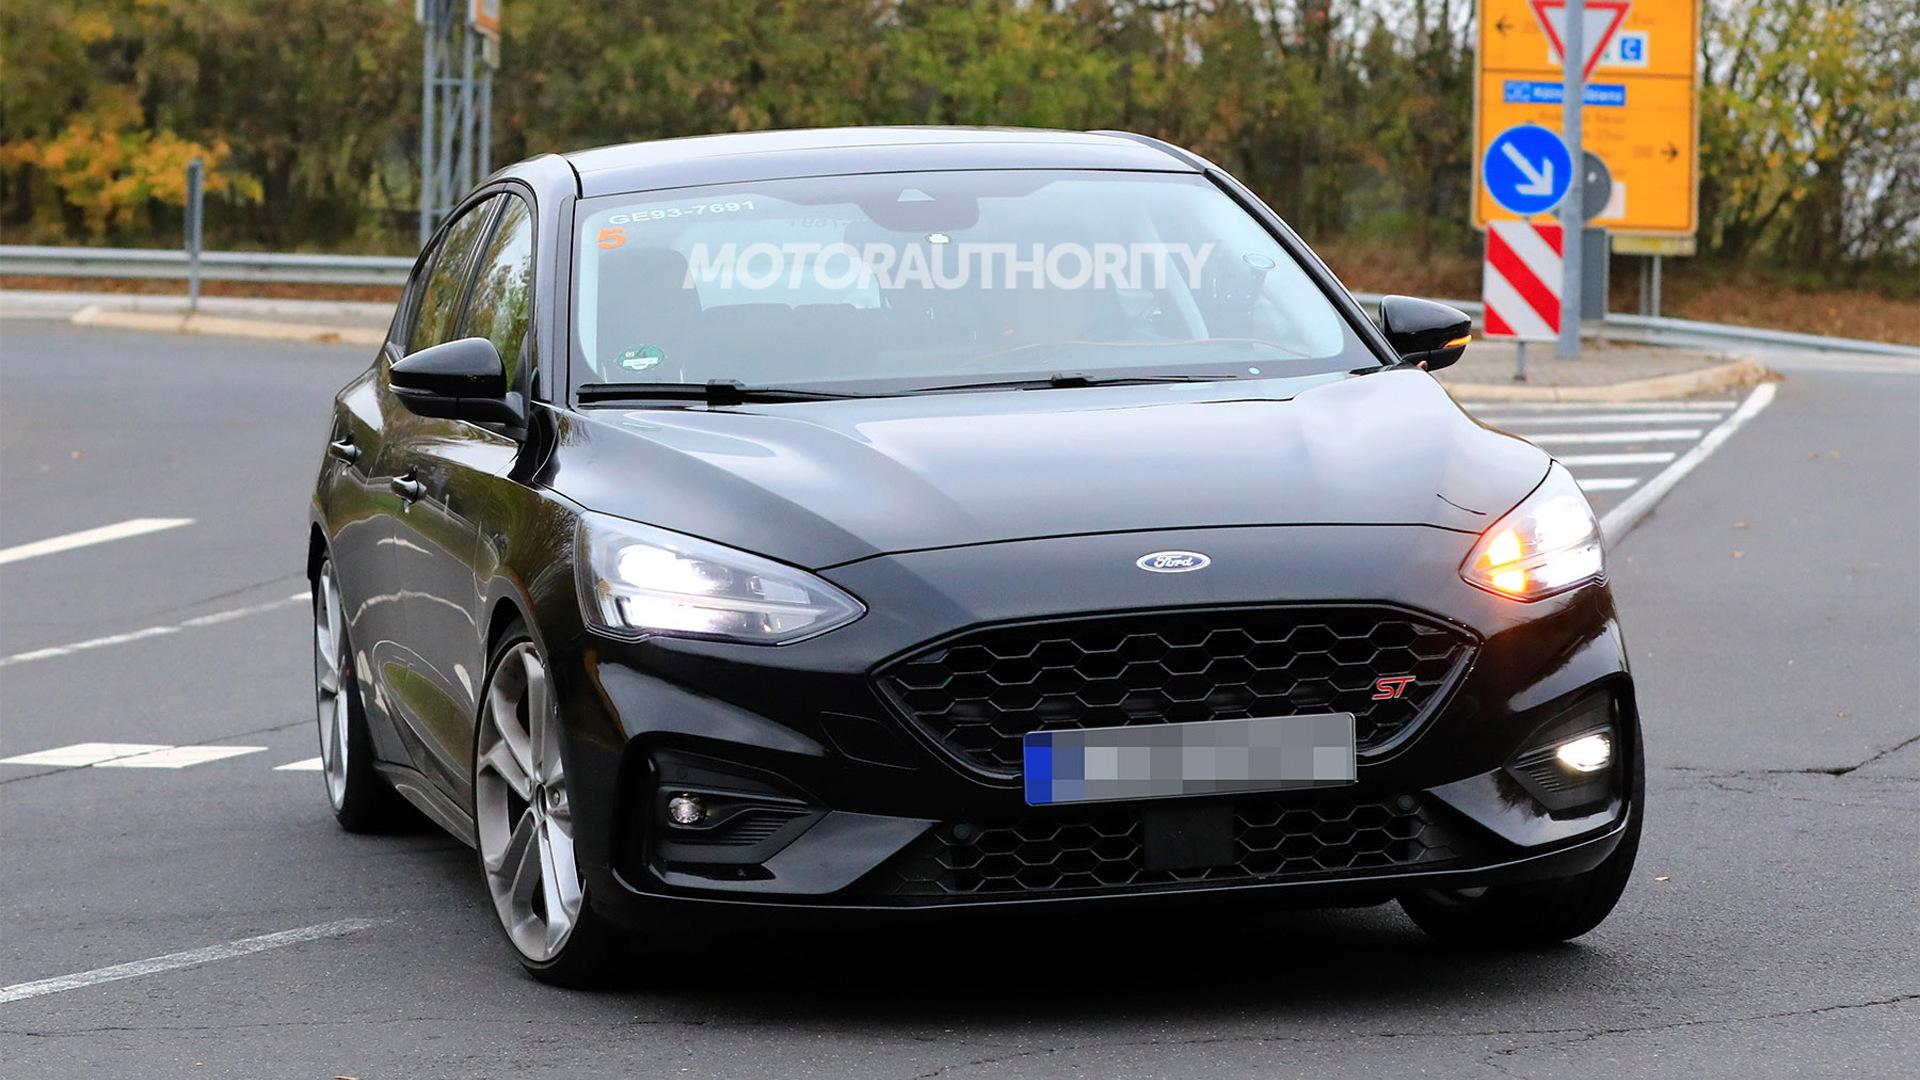 2019 Ford Focus ST spy shots - Image via S. Baldauf/SB-Medien